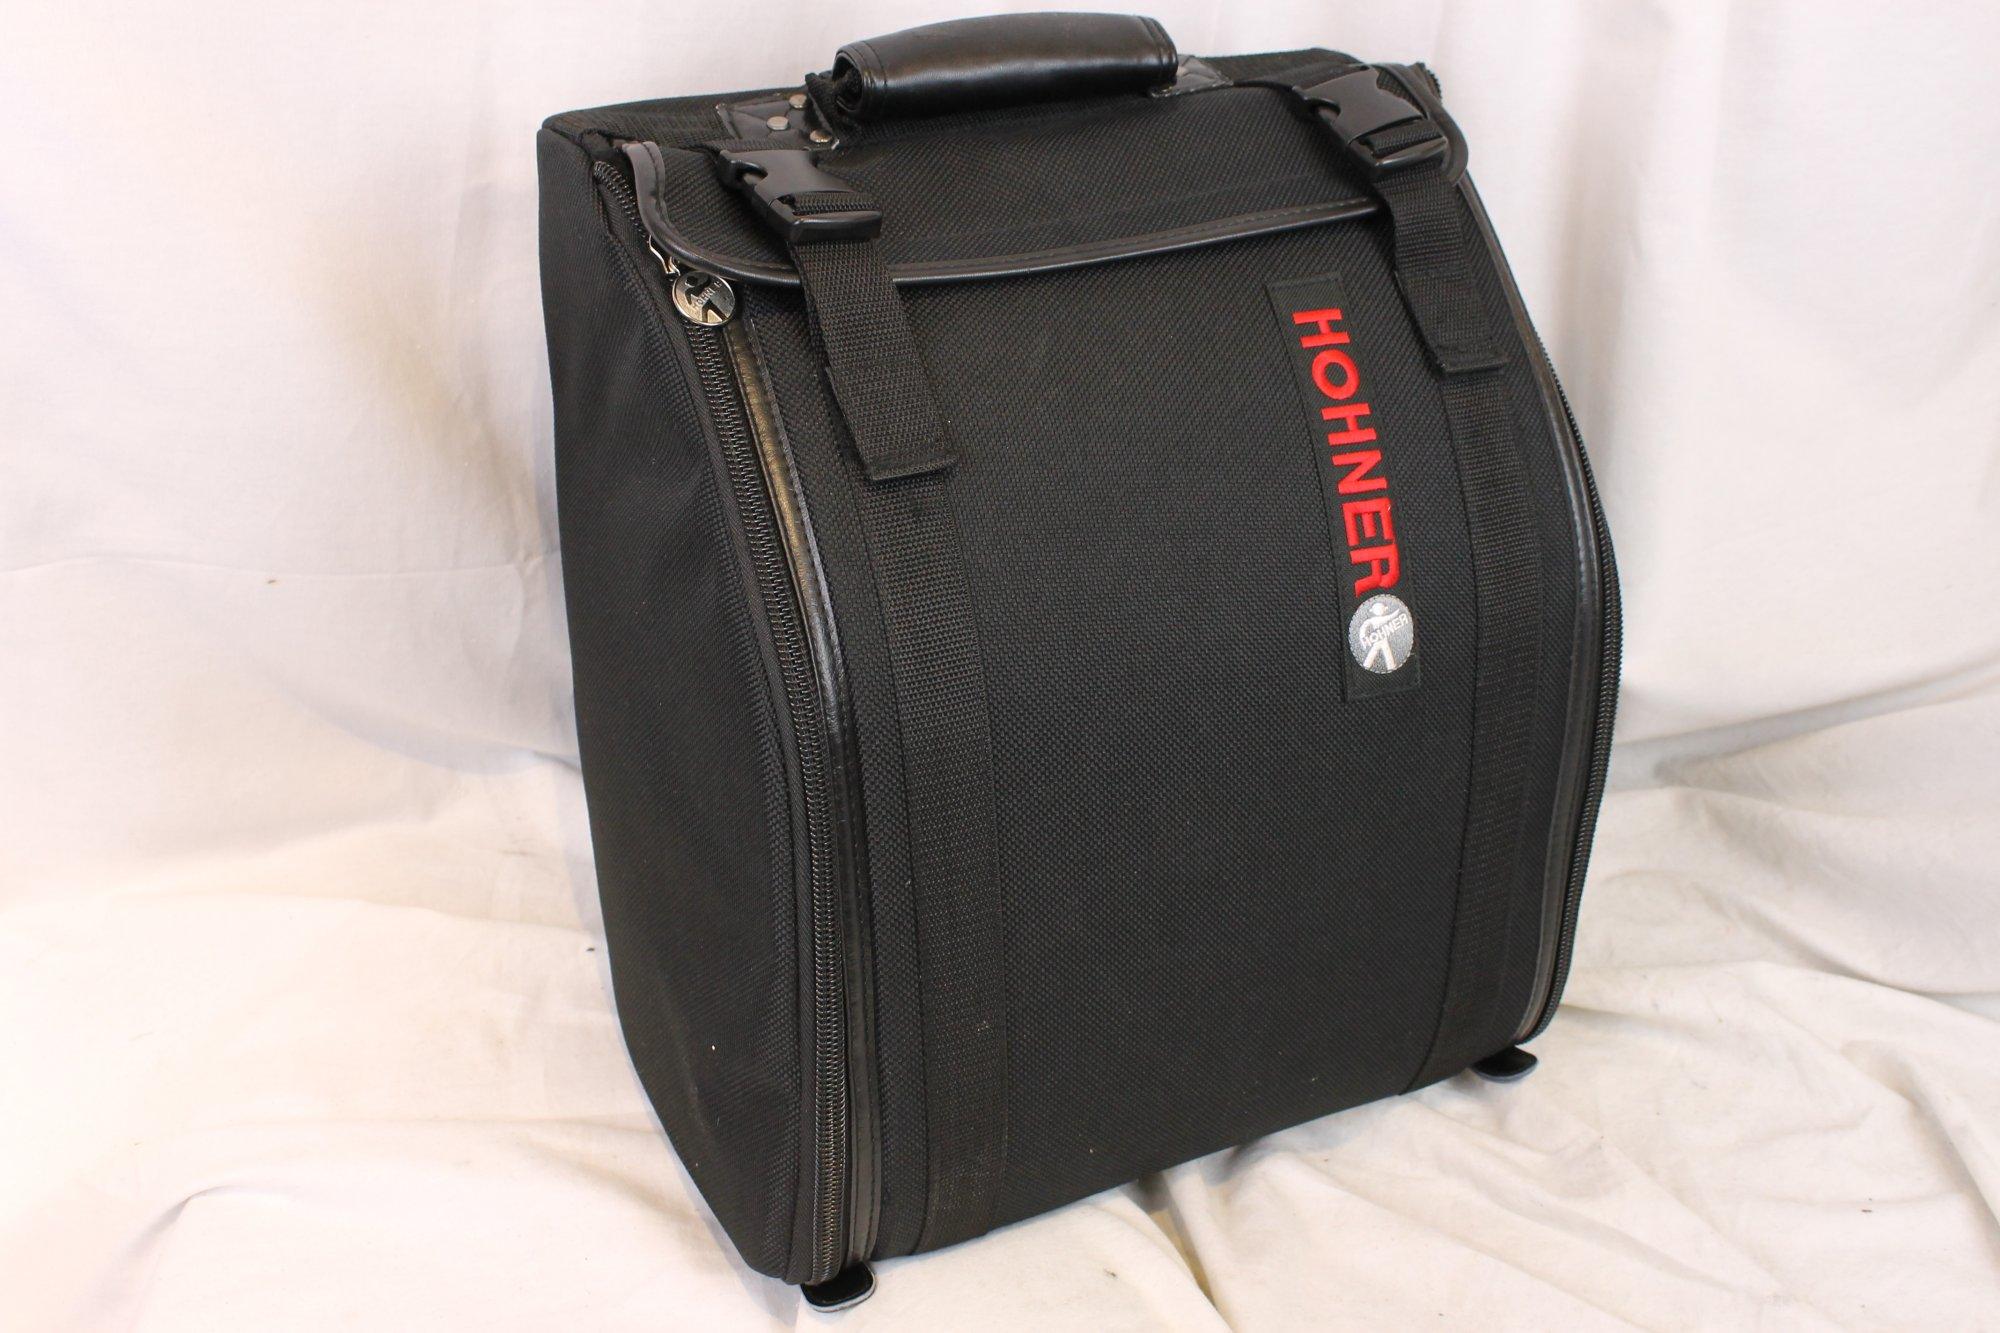 NEW Black Hohner Gig Bag for Accordion 13 x 8 x 16 fits Hohner Corona Extreme